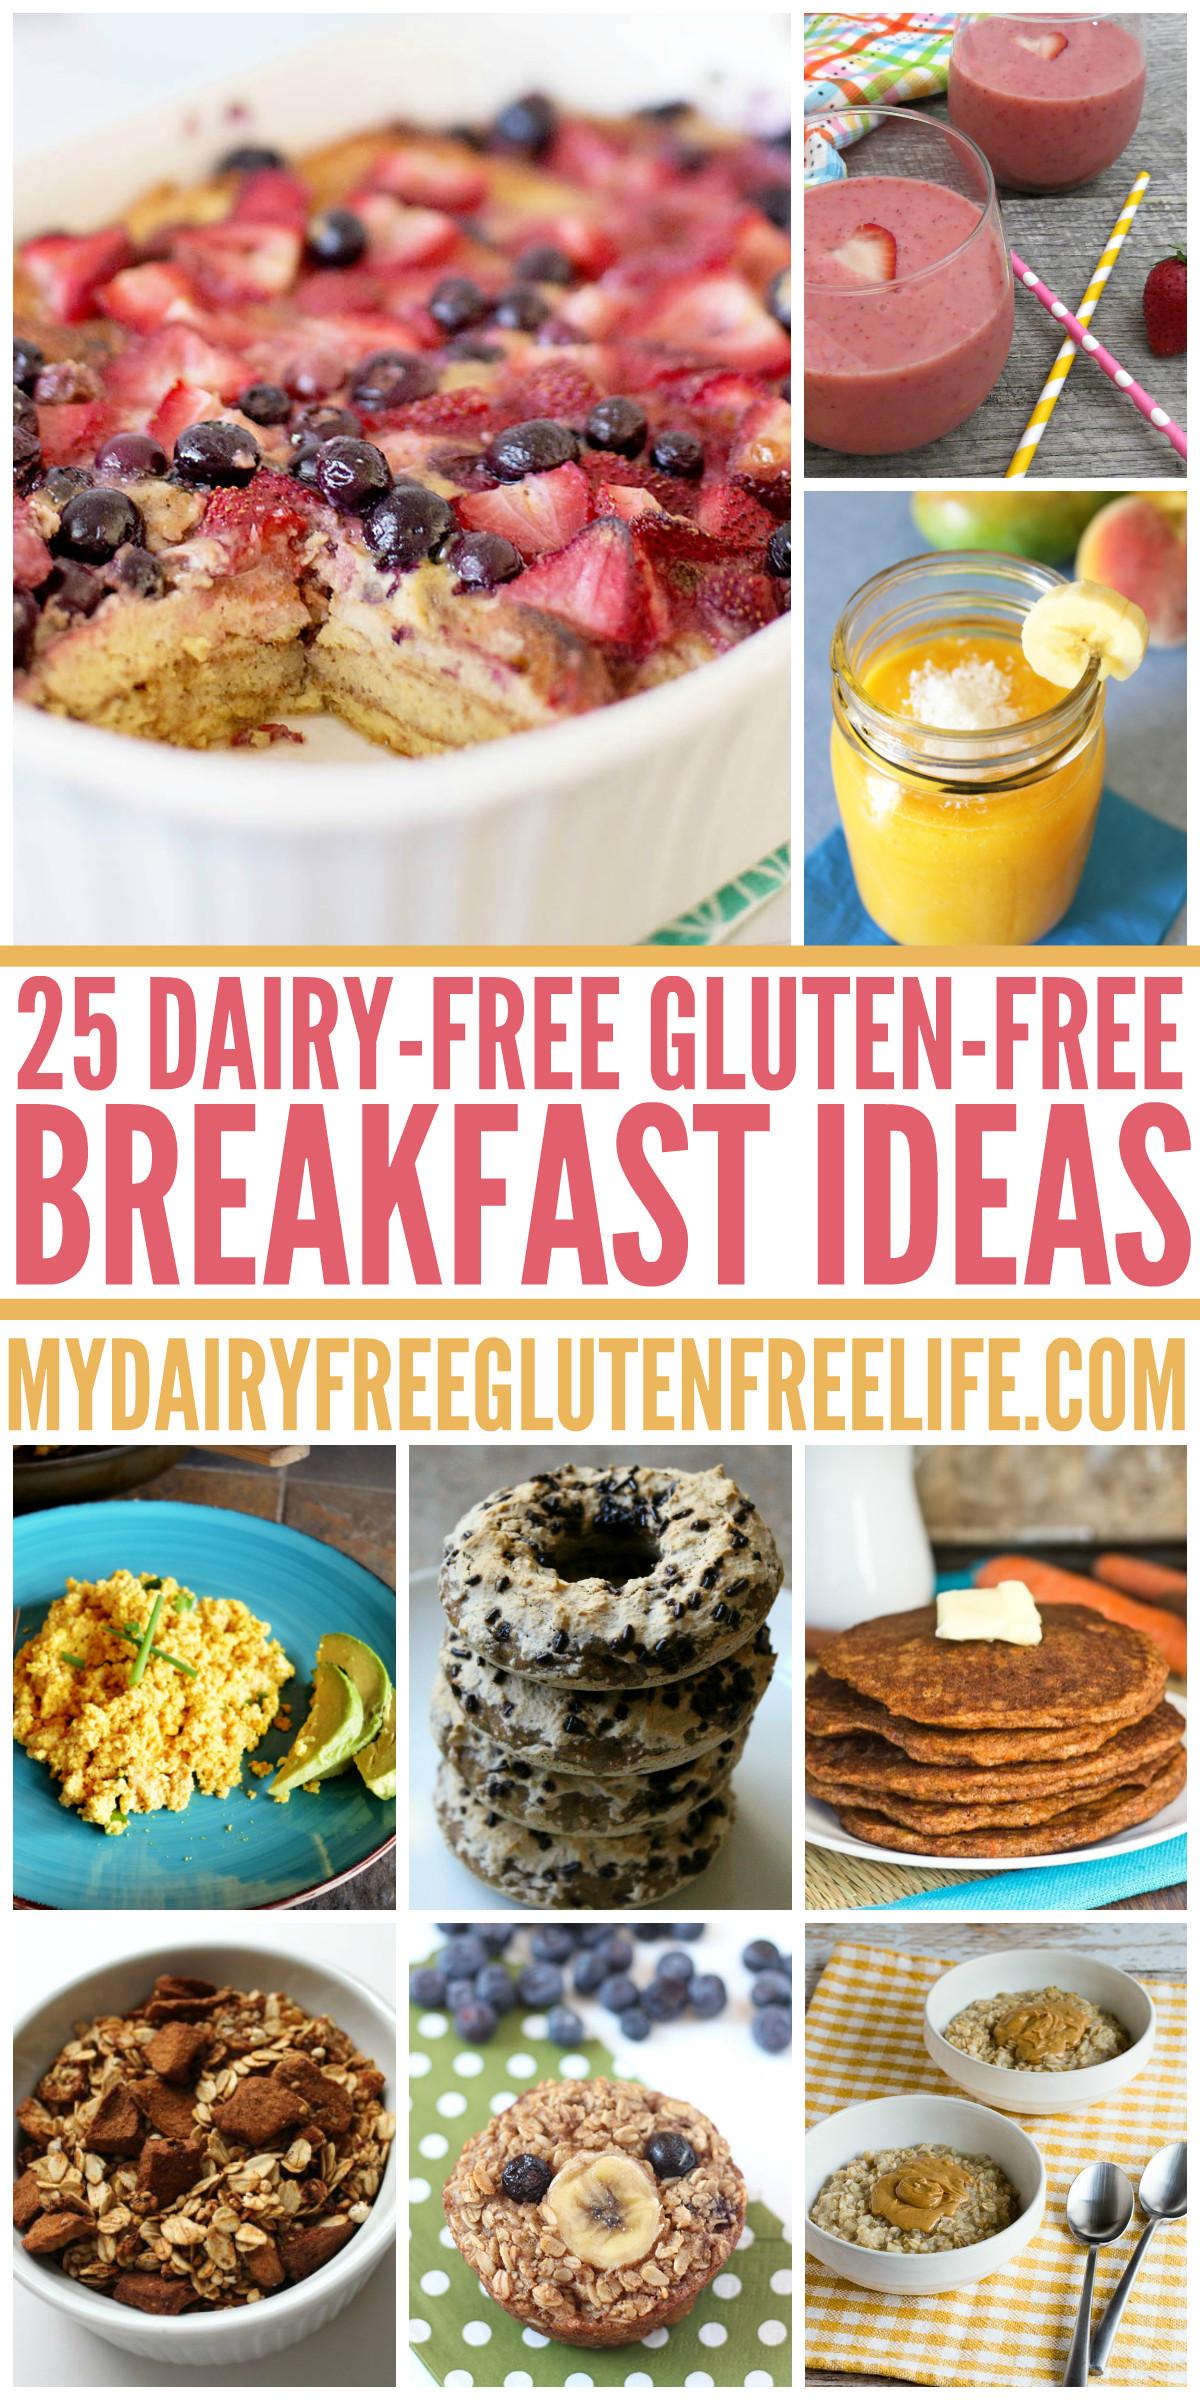 Gluten Free Dairy Free Breakfast Recipes  25 Dairy Free Gluten Free Breakfast Ideas My DairyFree